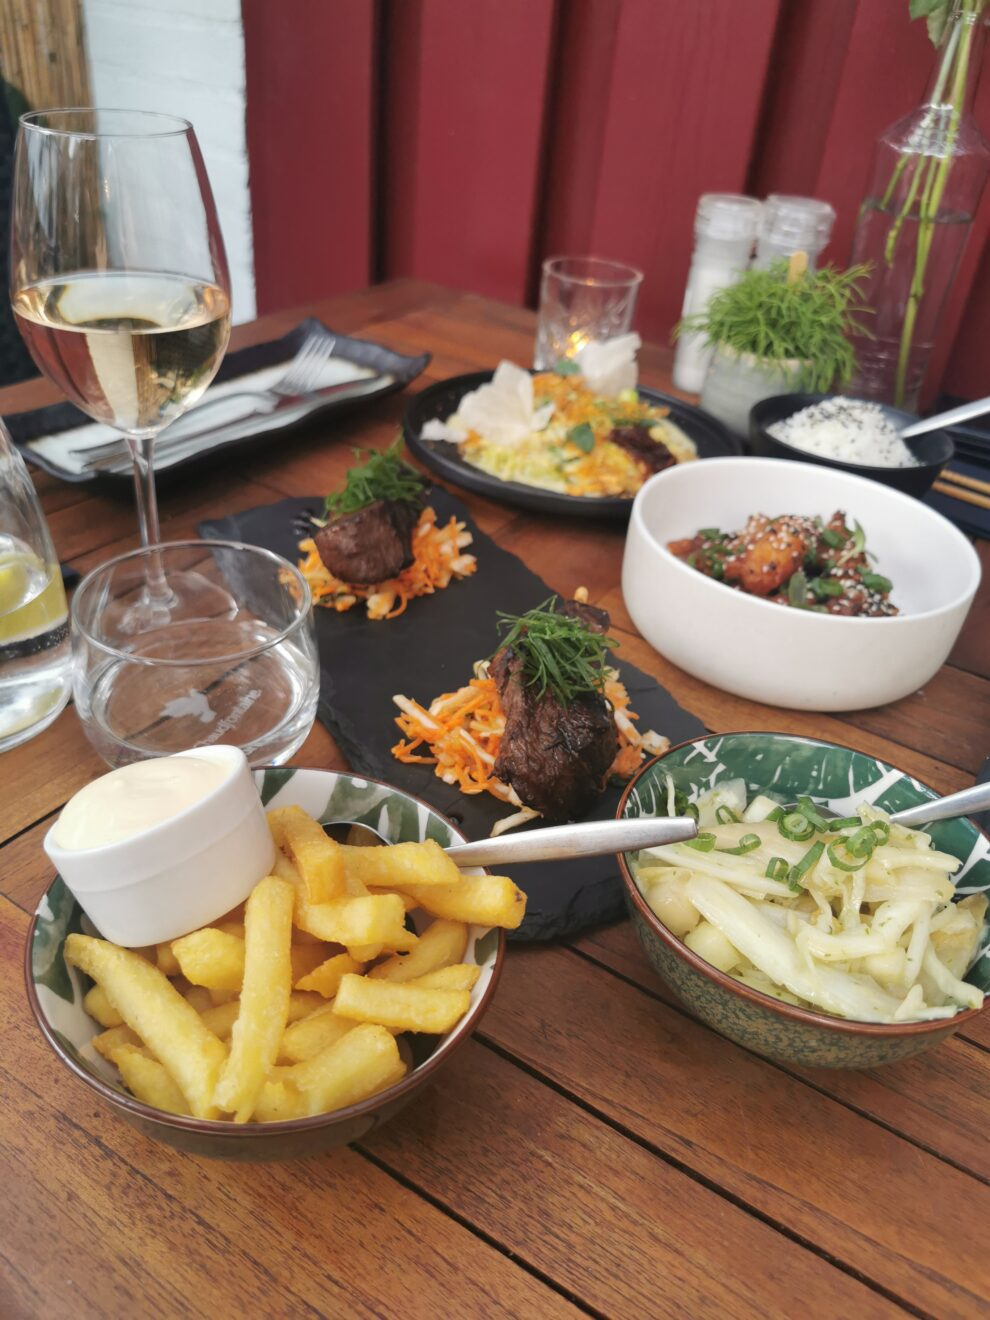 Shared dining bij Eetbar MikMak